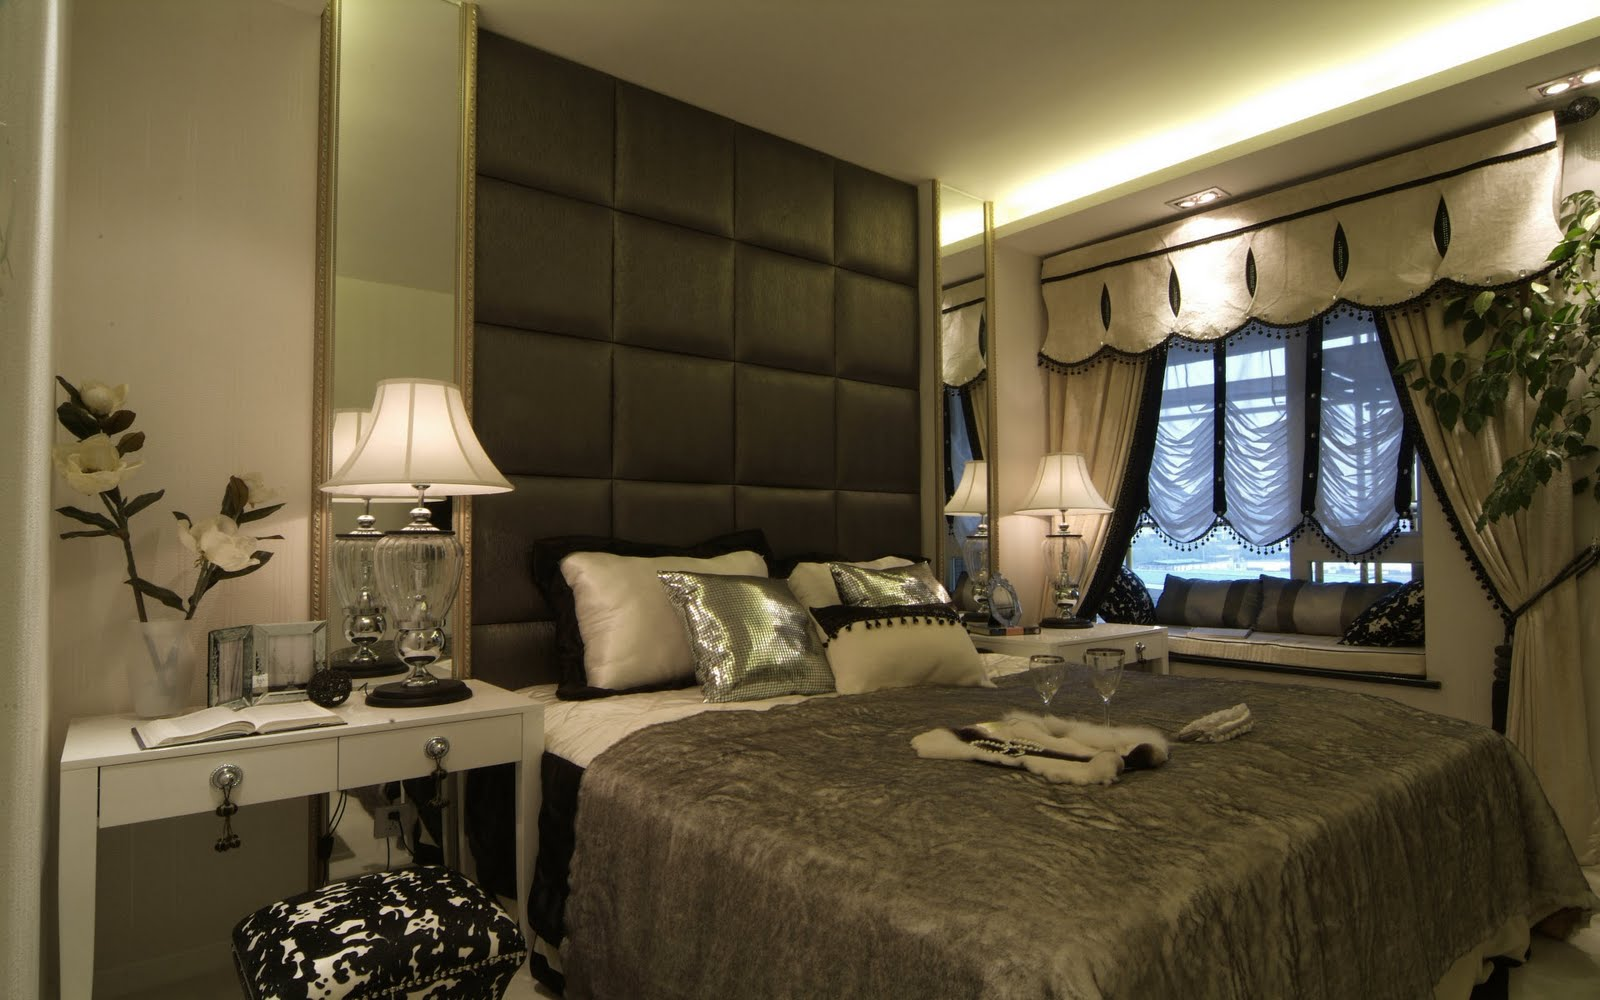 Home Interior Pictures: Home interior design 30